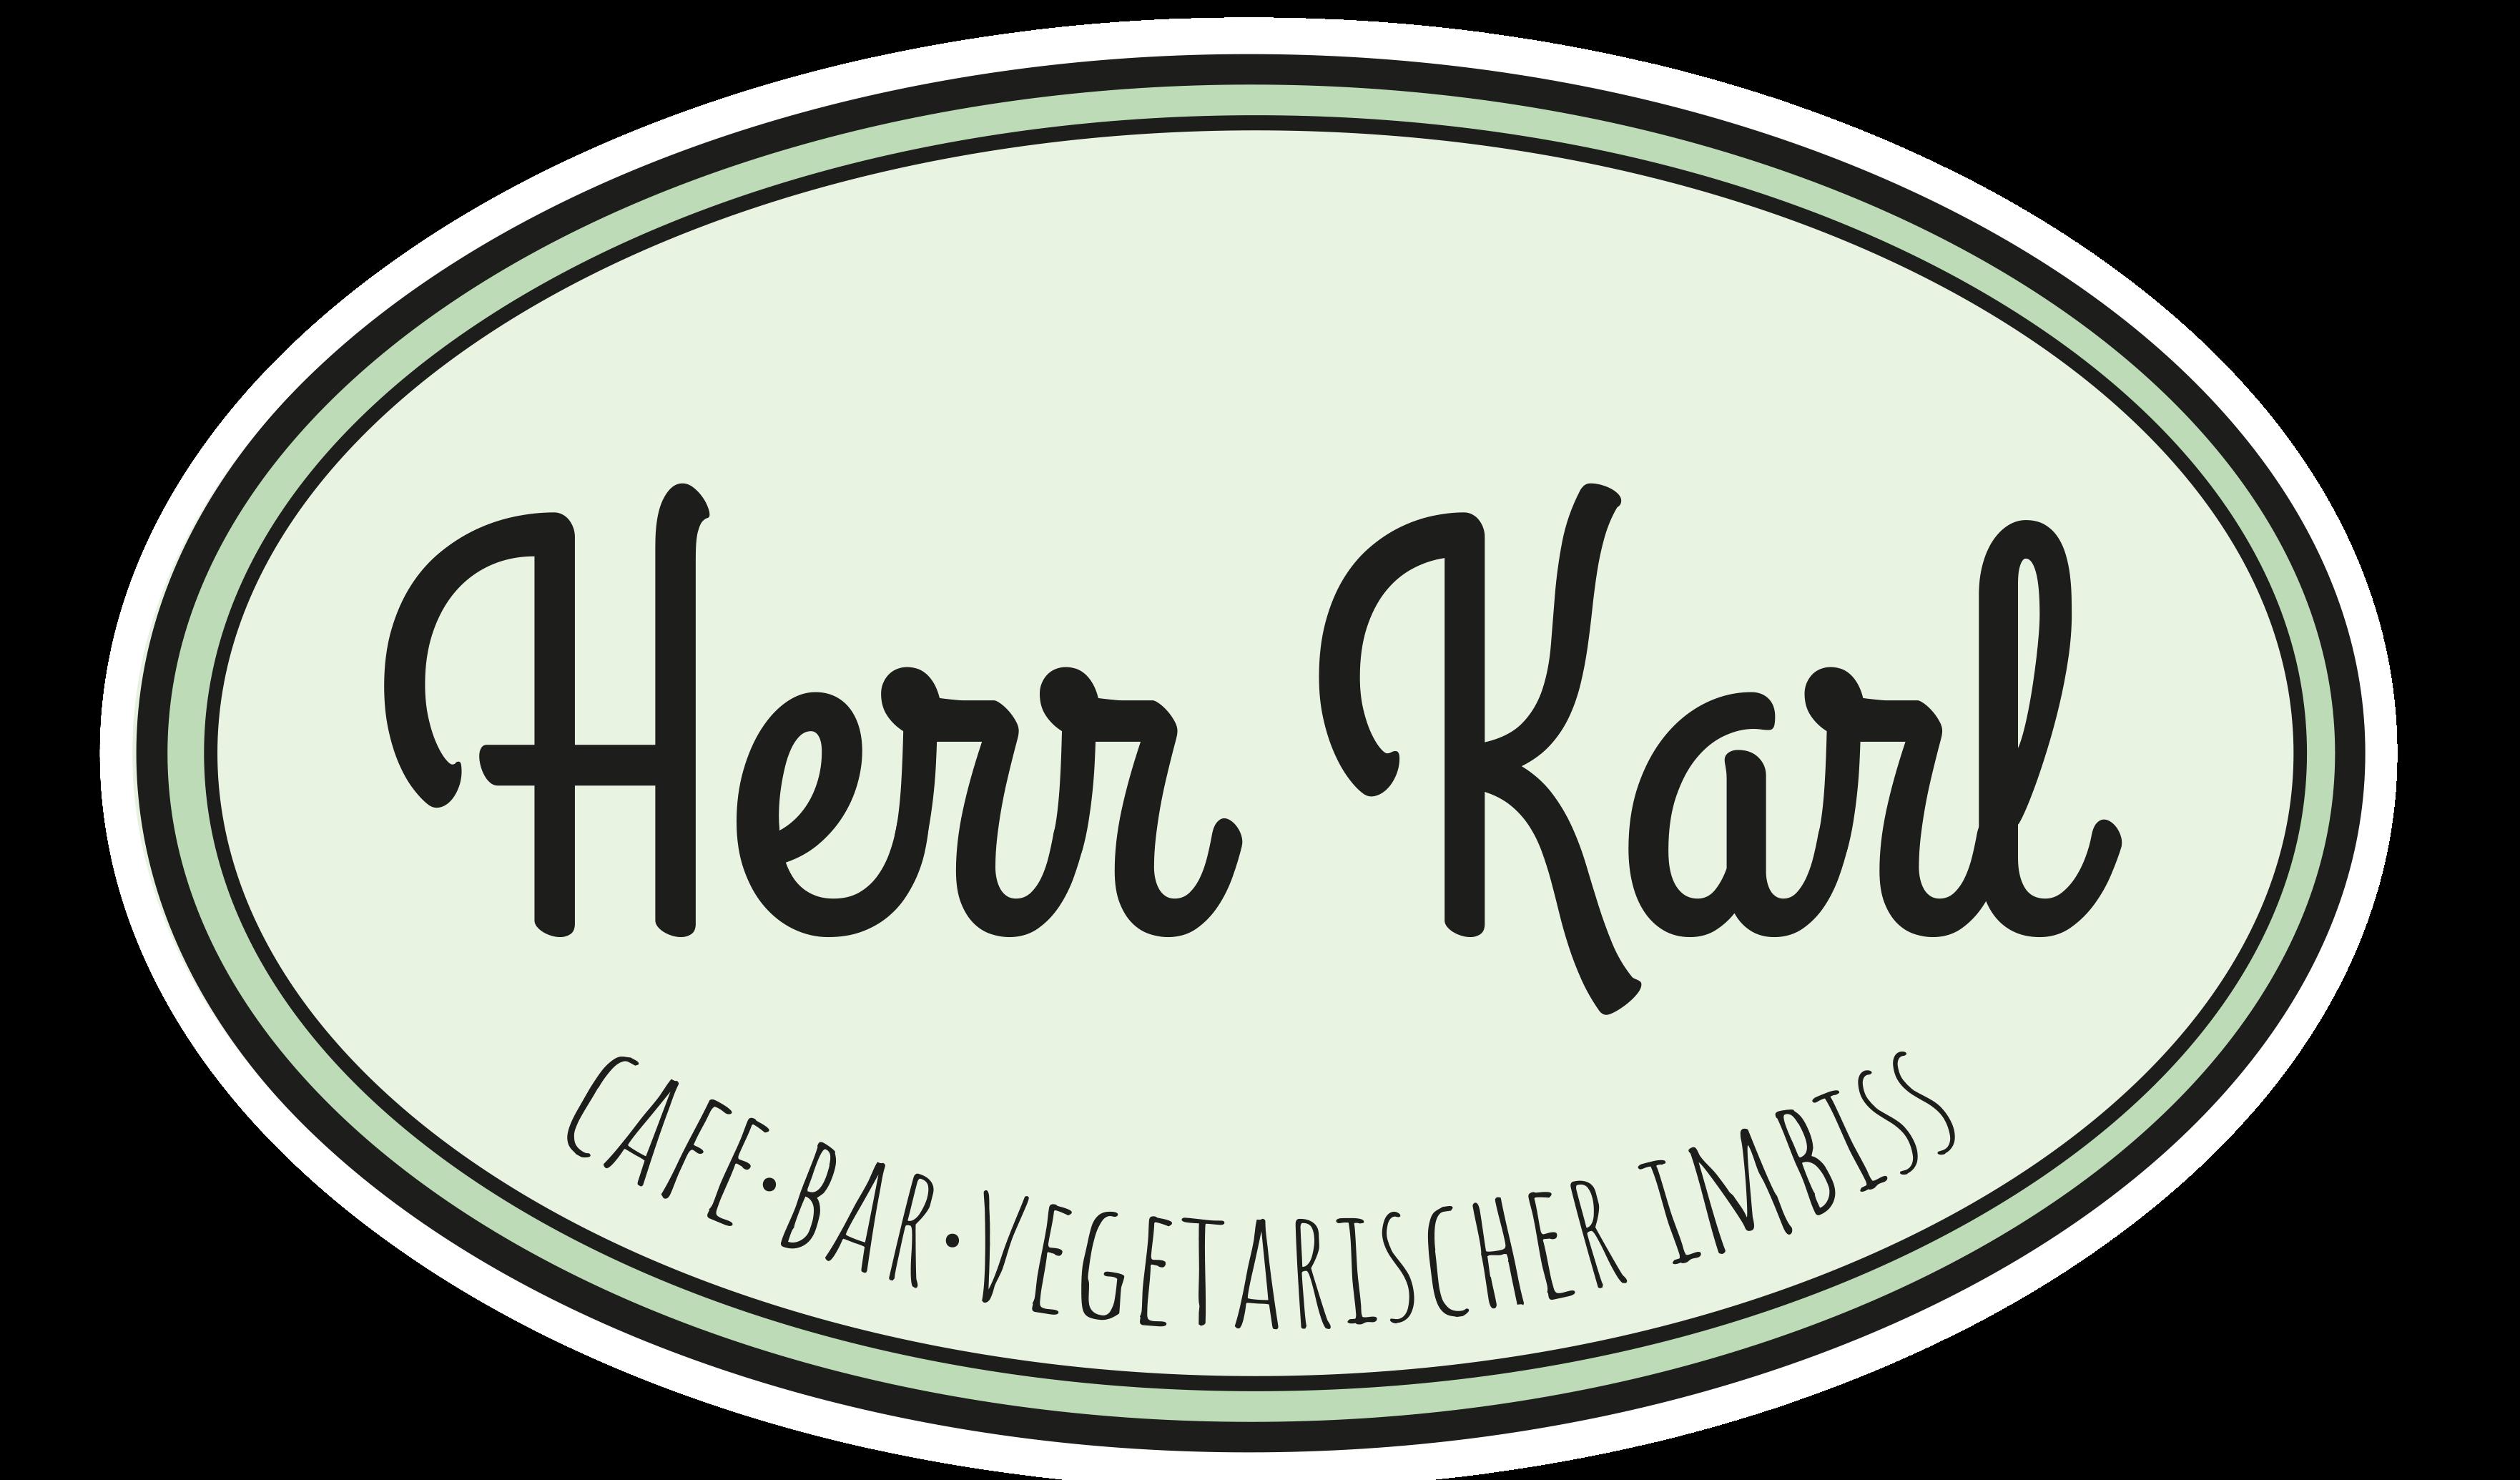 Cafe Herr Karl